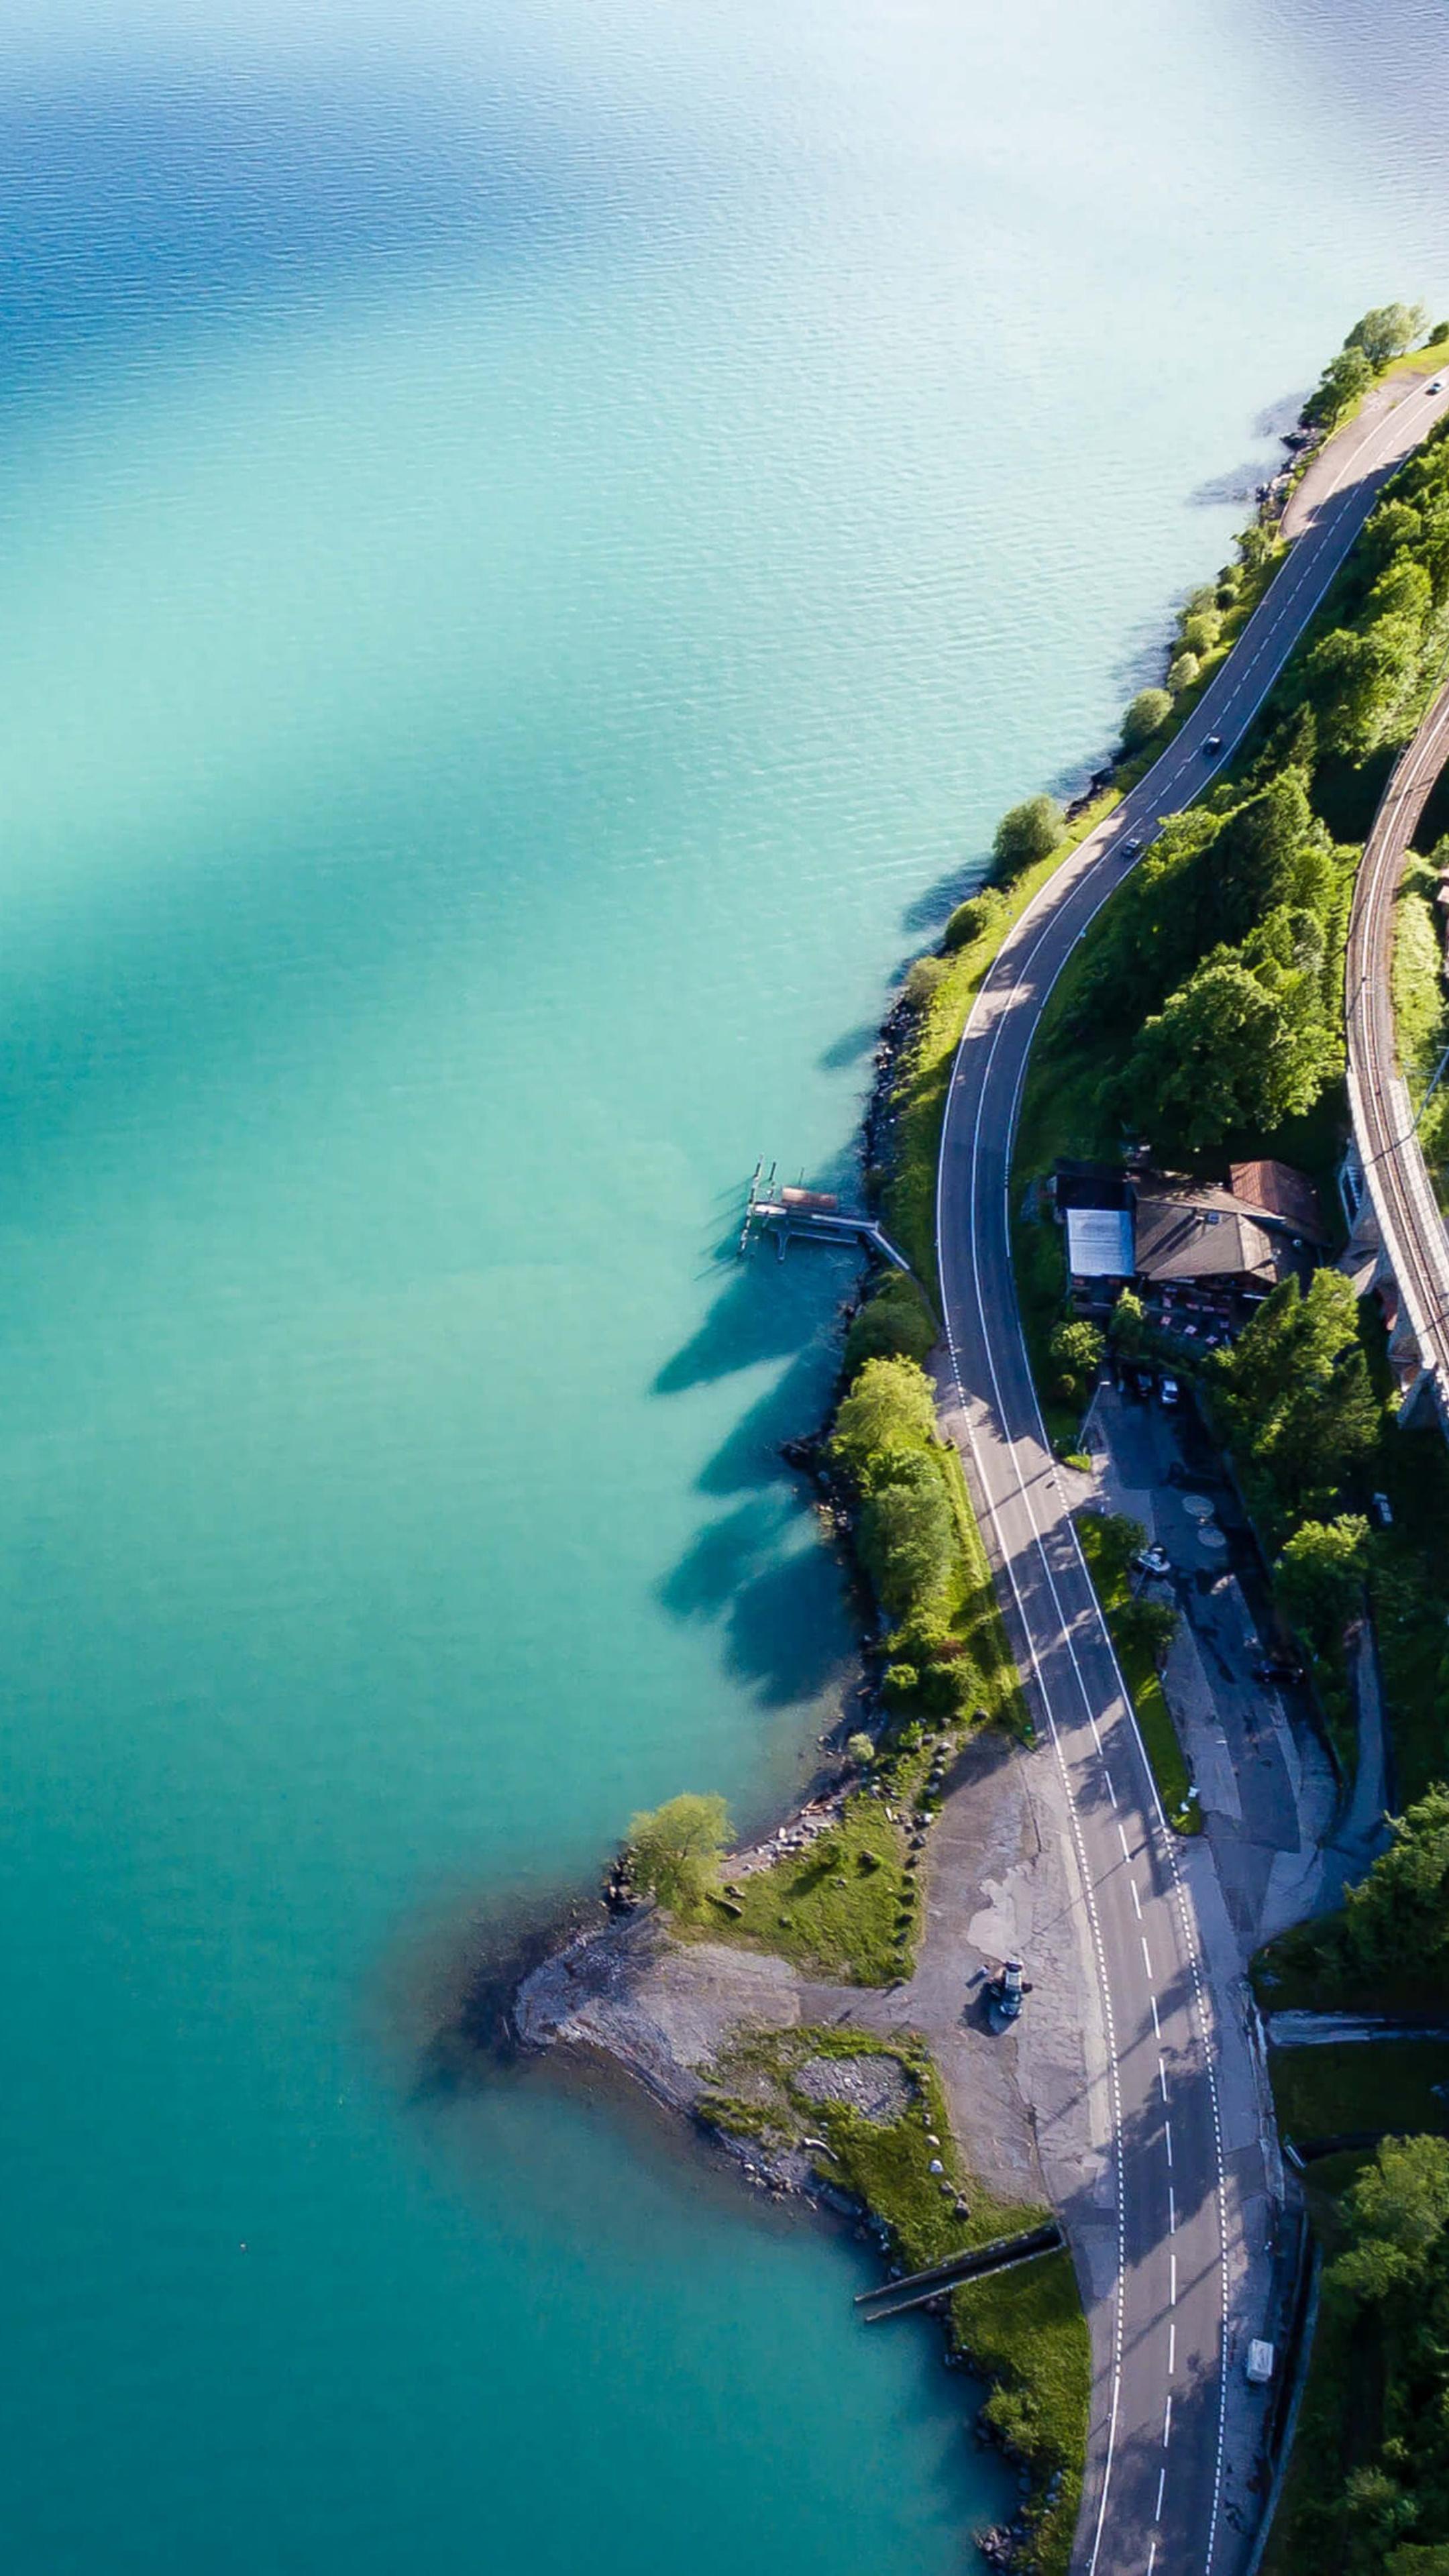 landscape-road-water-trees-4k-we.jpg